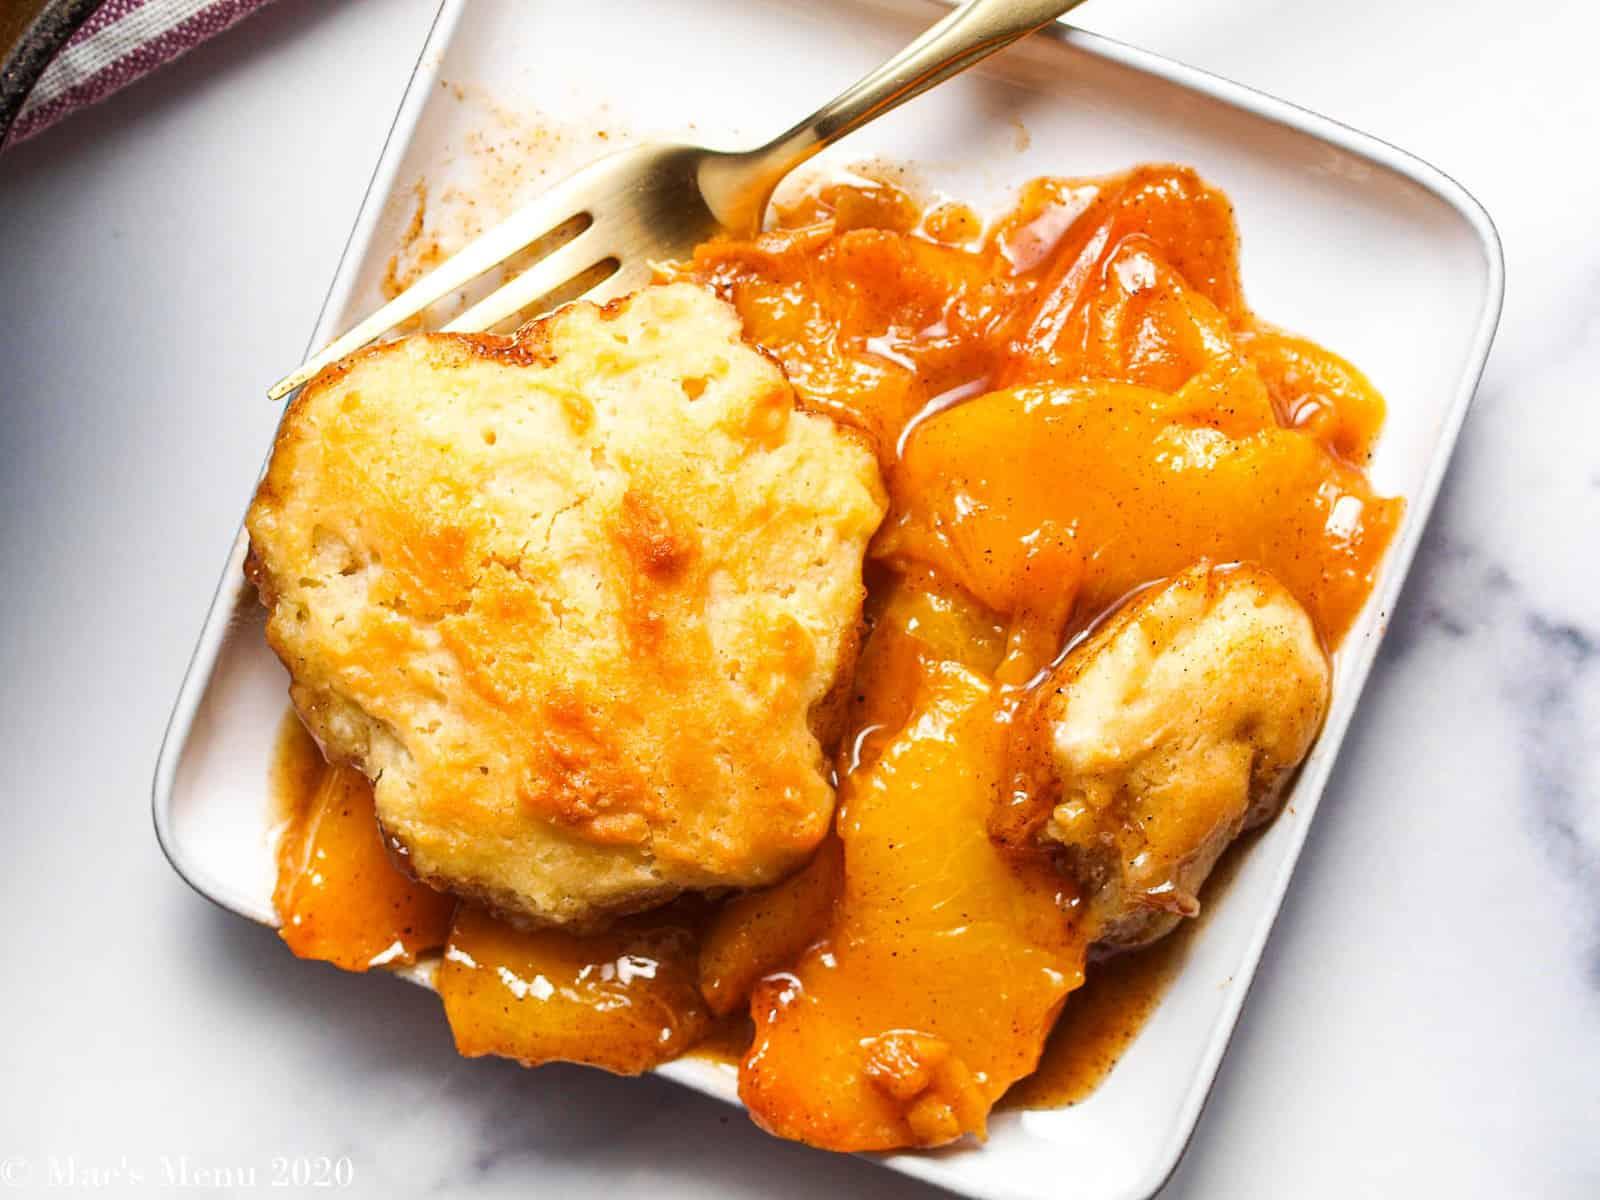 An overhead shot of a small dish of gluten-free peach cobbler on it.